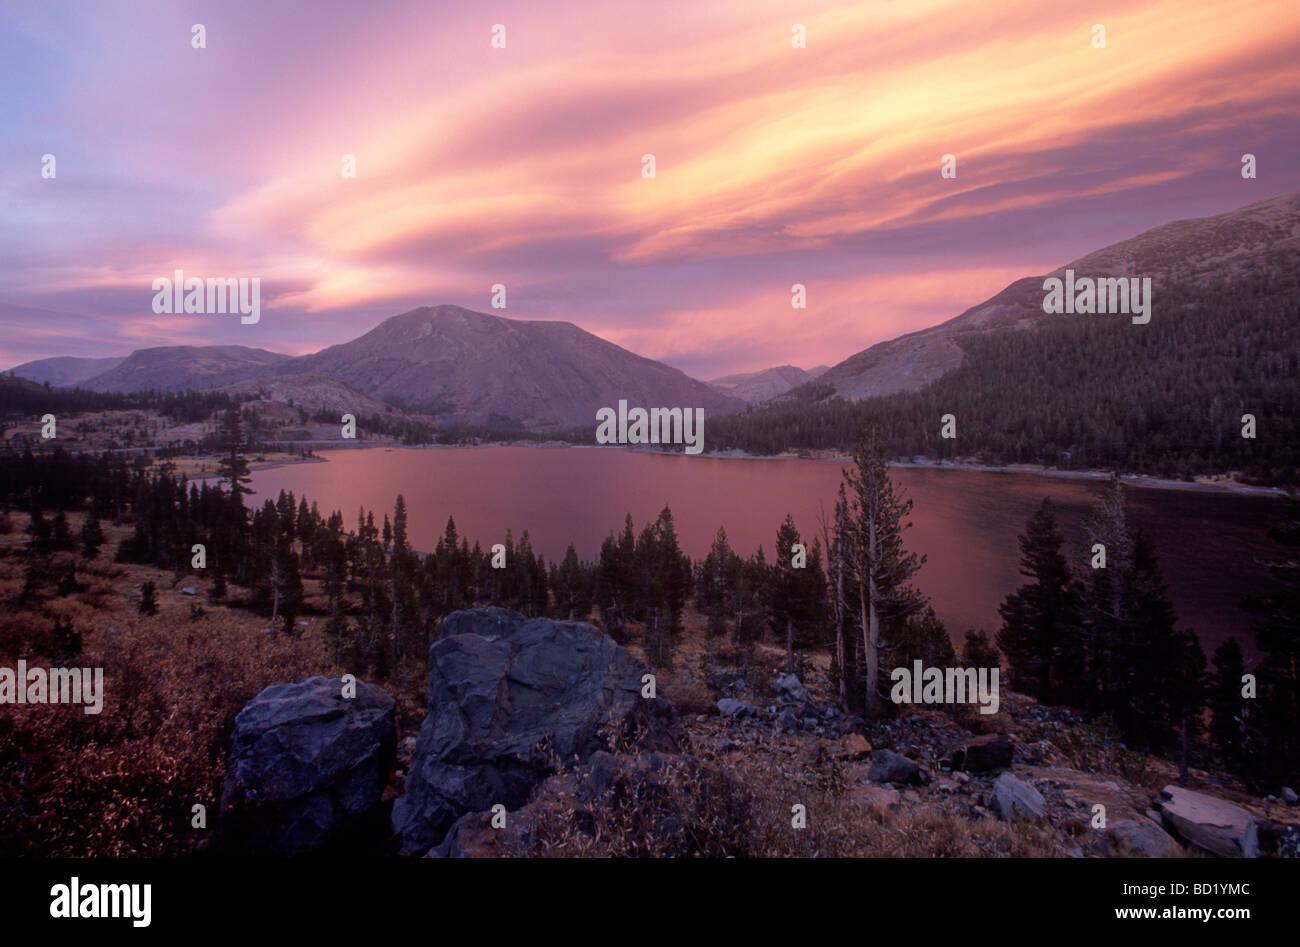 Linsenförmige Wolken & Berge, Tioga Pass, Kalifornien. Stockbild